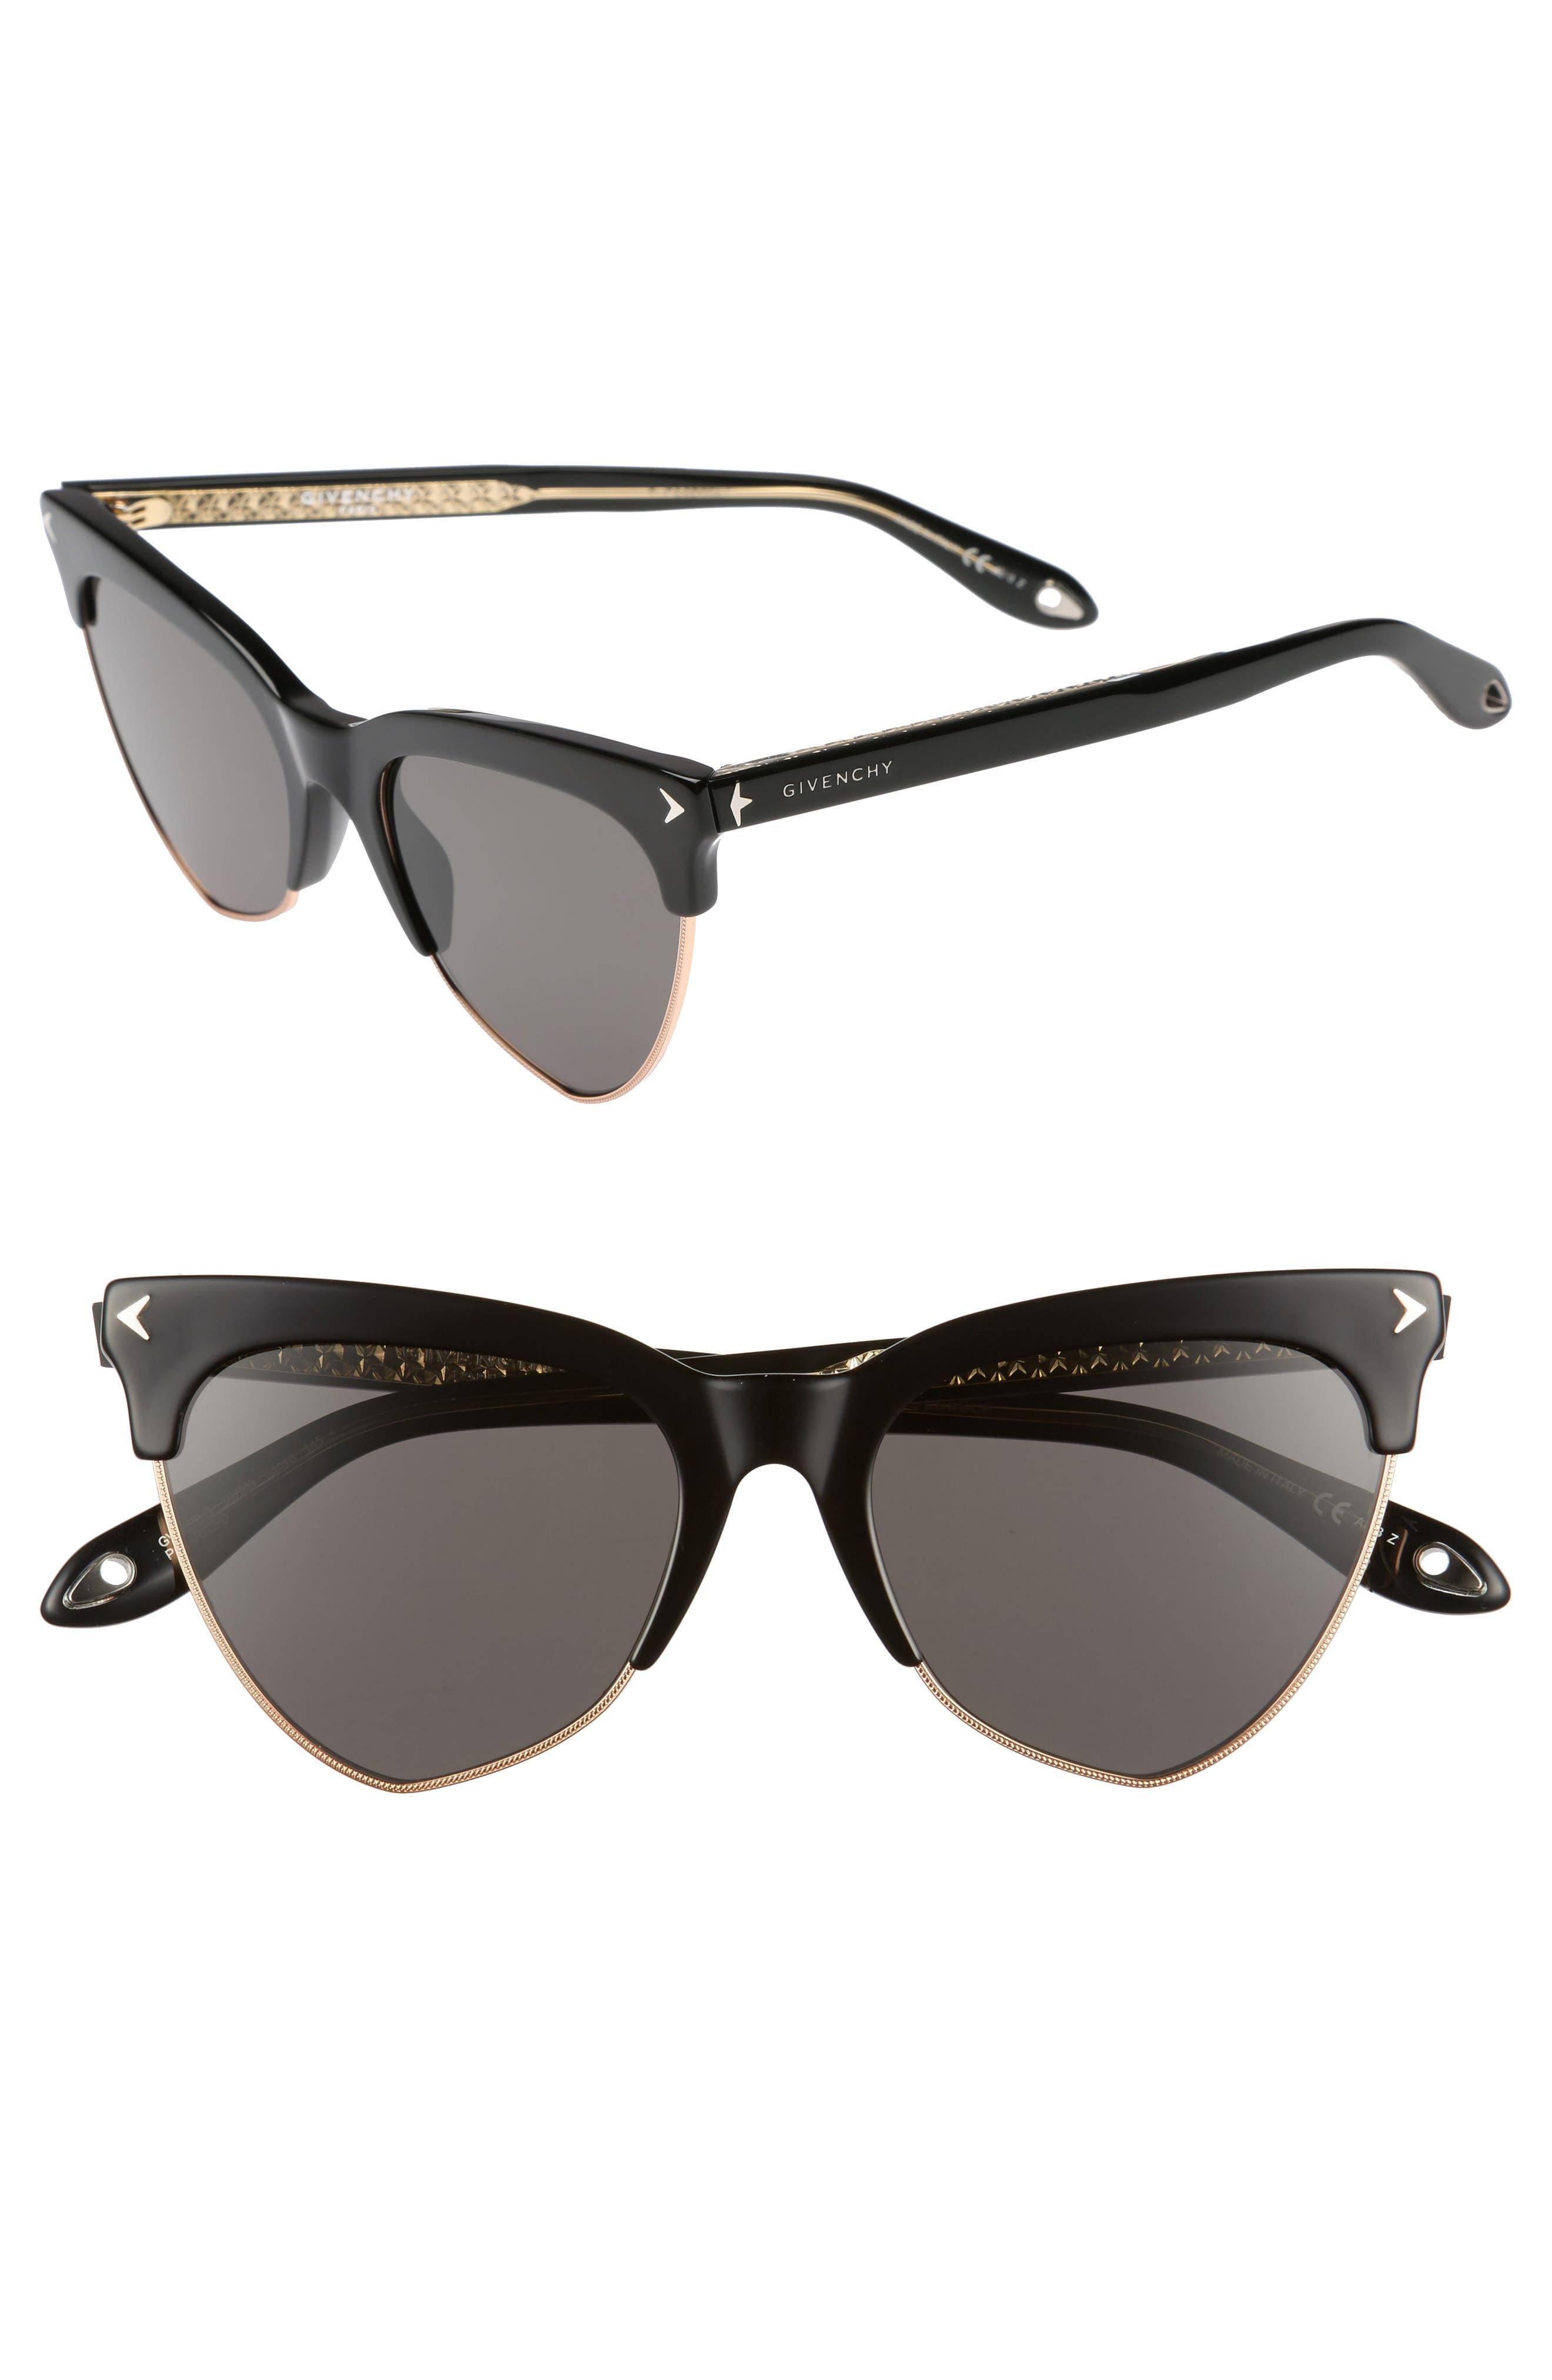 54mm Polarized Cat Eye Sunglasses,                             Main thumbnail 1, color,                             001